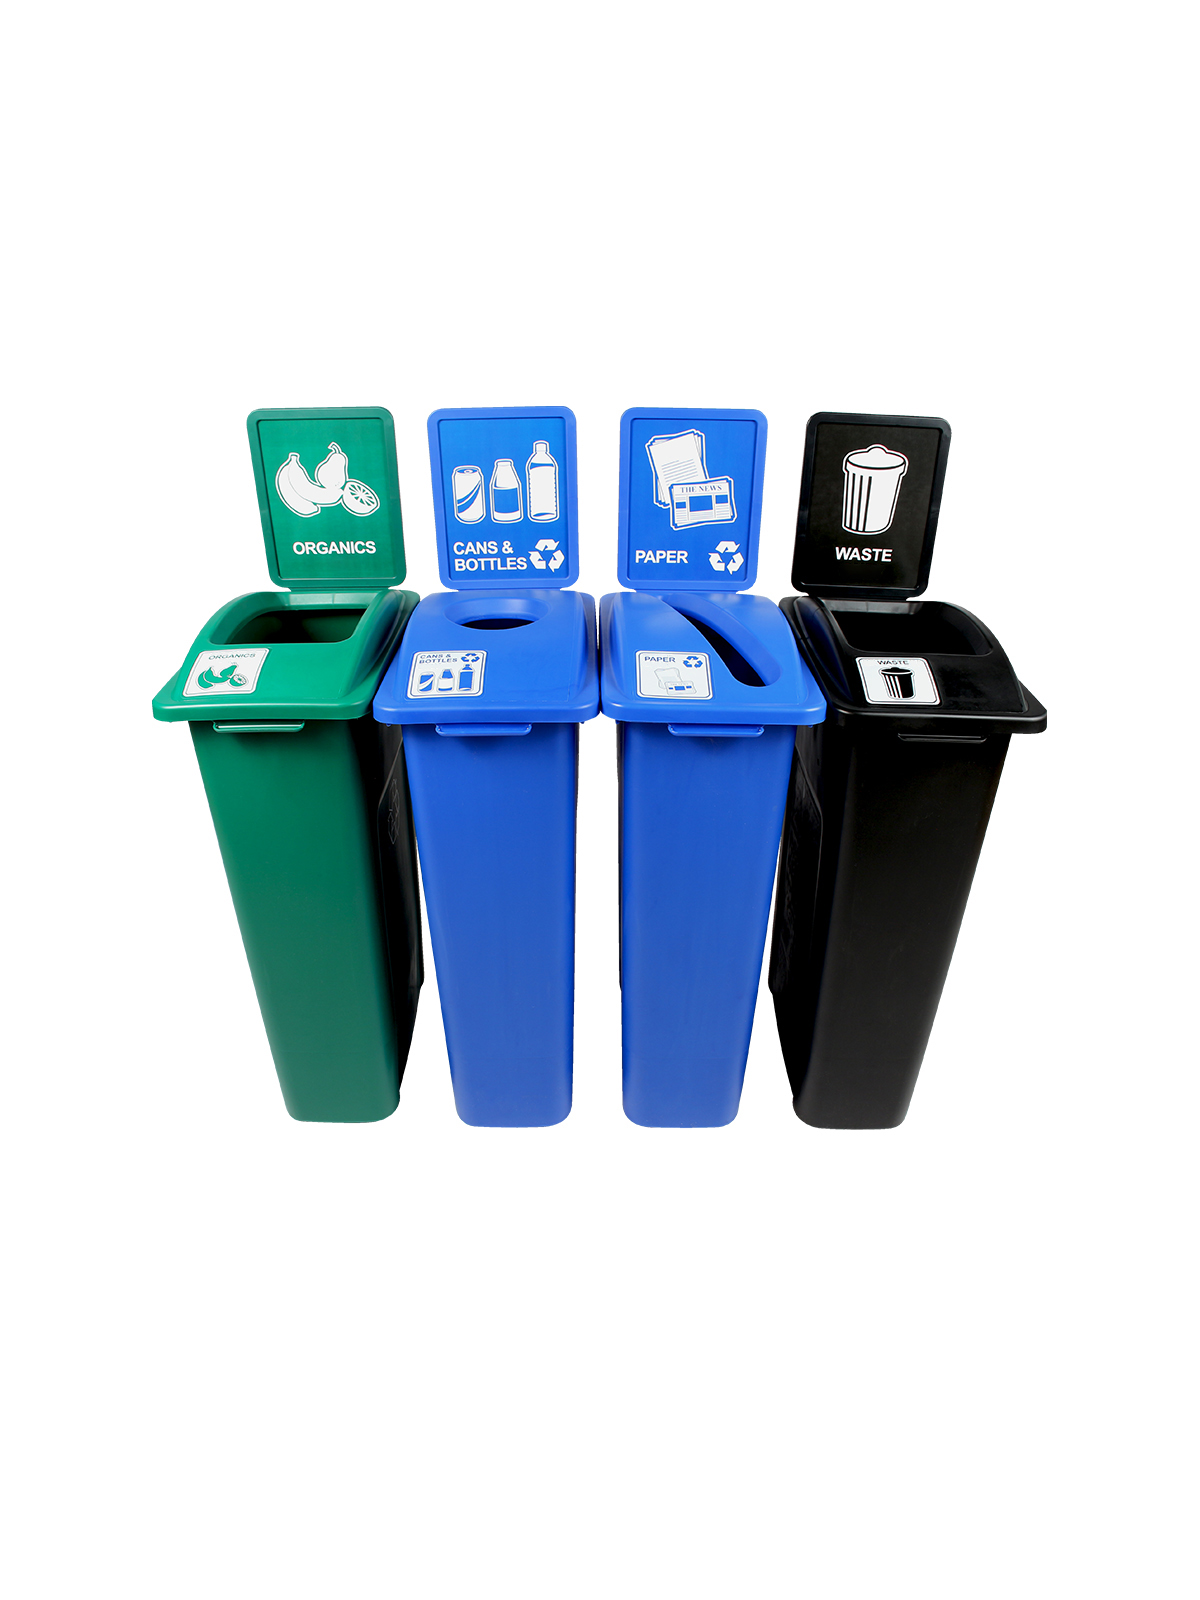 WASTE WATCHER - Quad - Cans & Bottles-Paper-Organics-Waste - Circle-Slot-Full - Blue-Blue-Green-Black